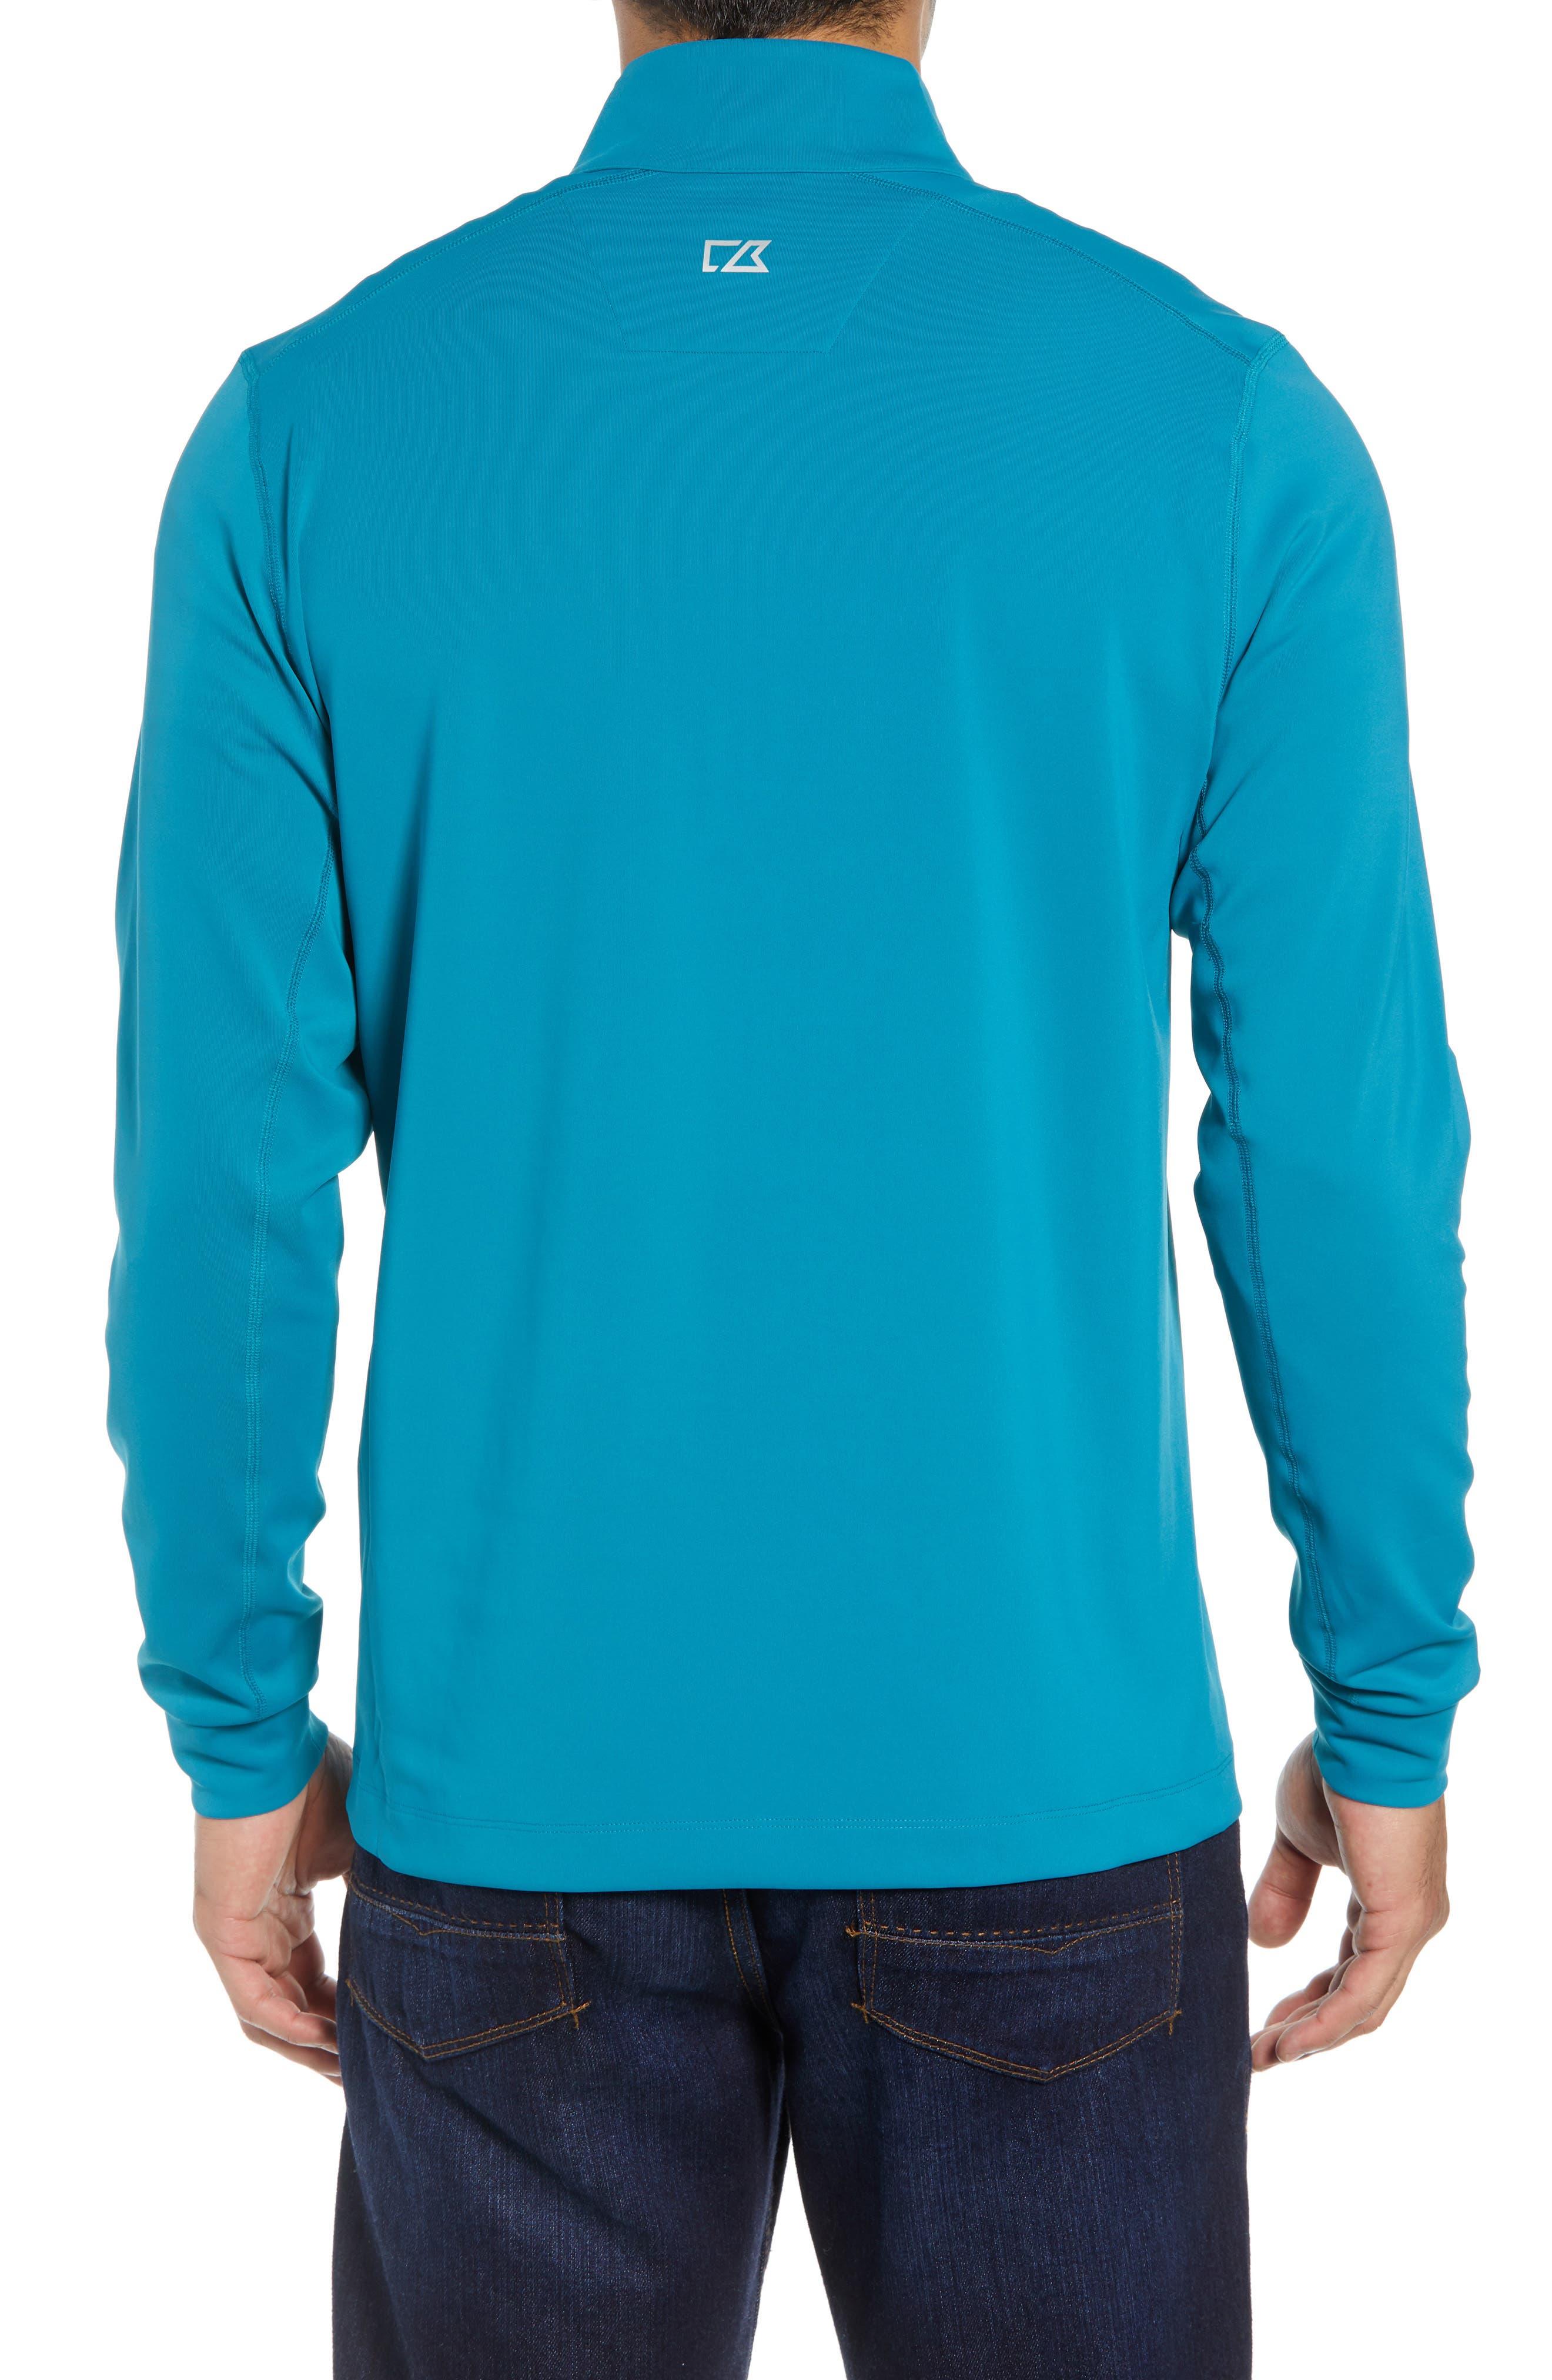 Traverse Regular Fit Quarter Zip Pullover,                             Alternate thumbnail 2, color,                             TEAL BLUE